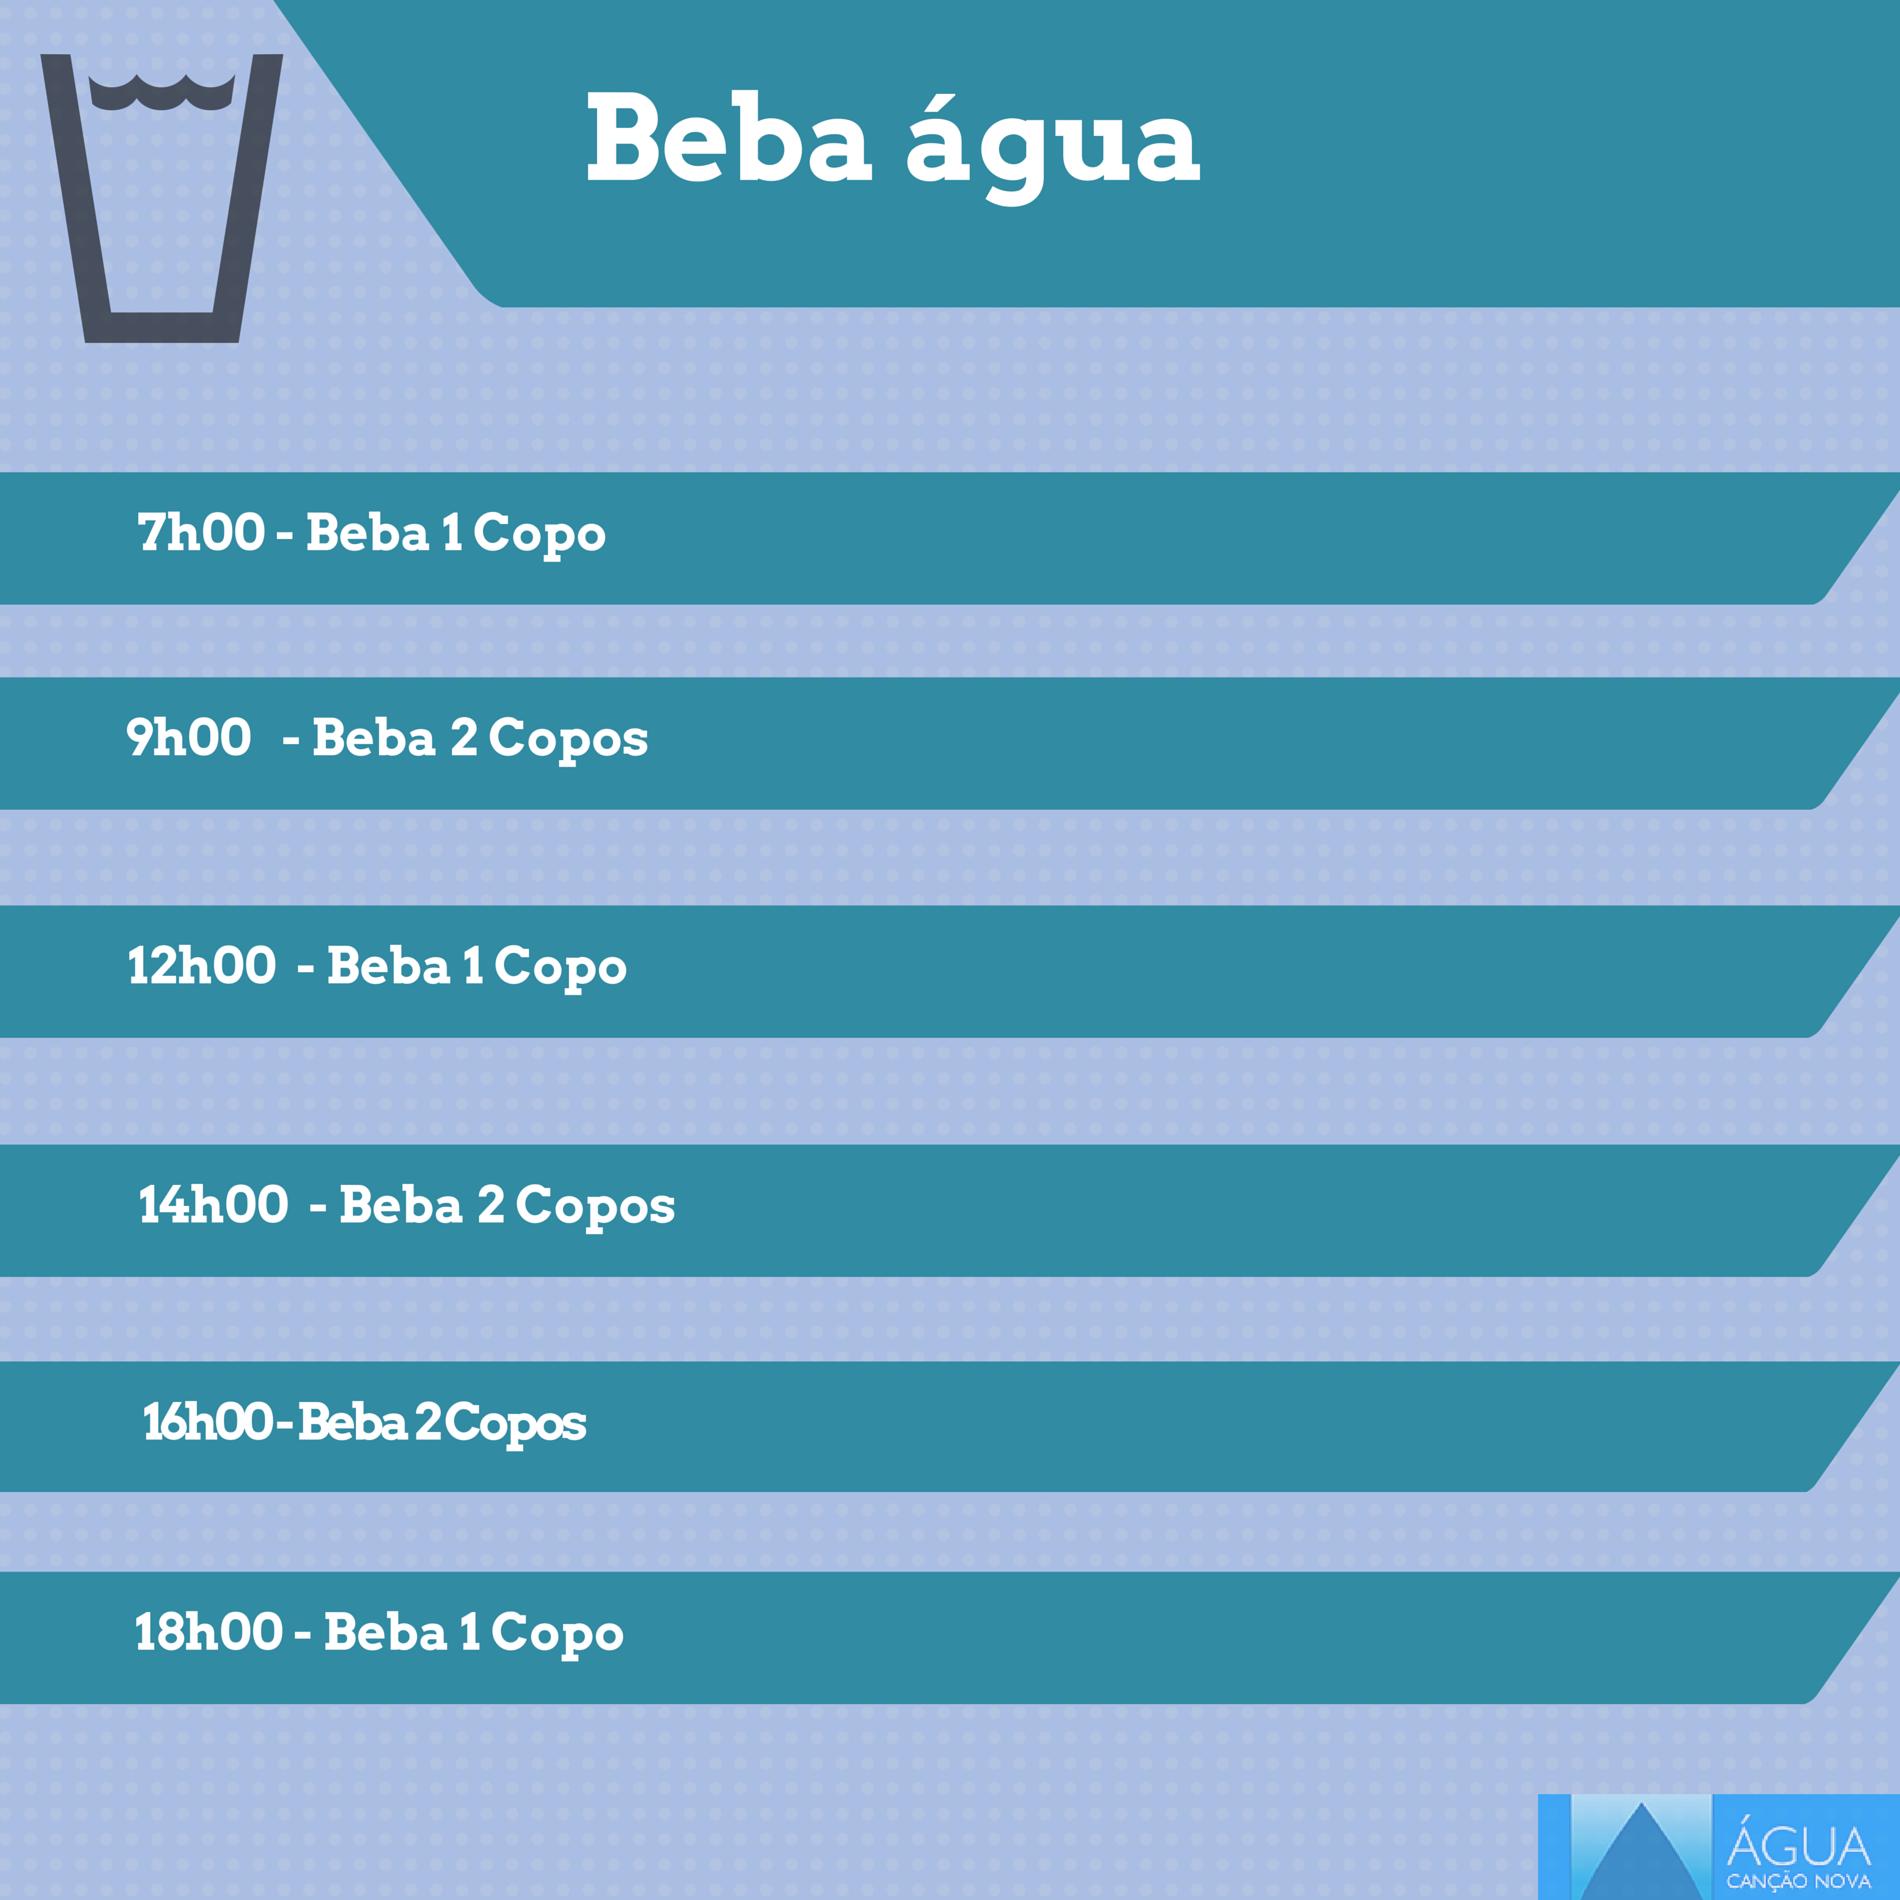 hora_certa_para_beber_agua